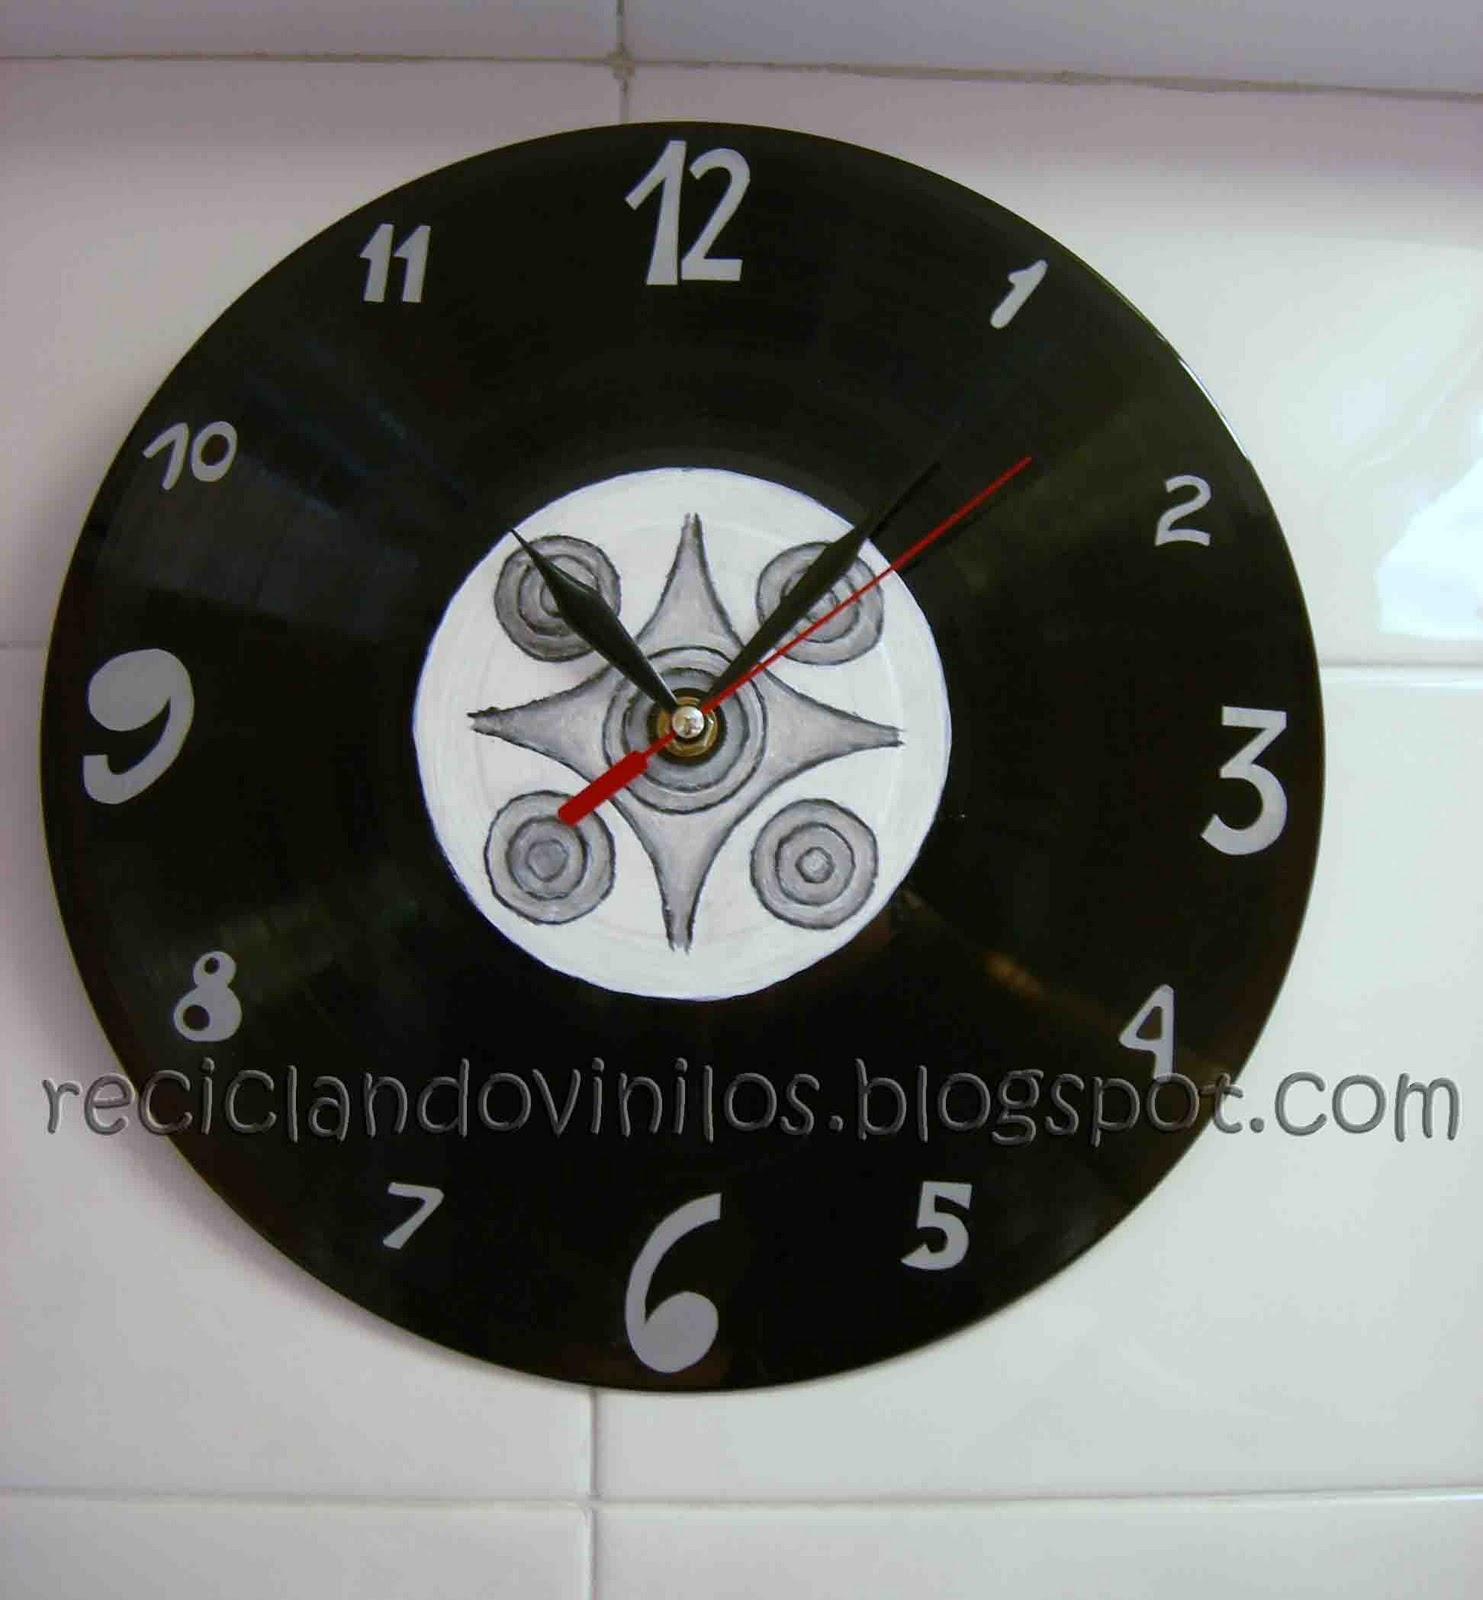 Itziar reciclando vinilos relojes - Relojes de vinilo ...